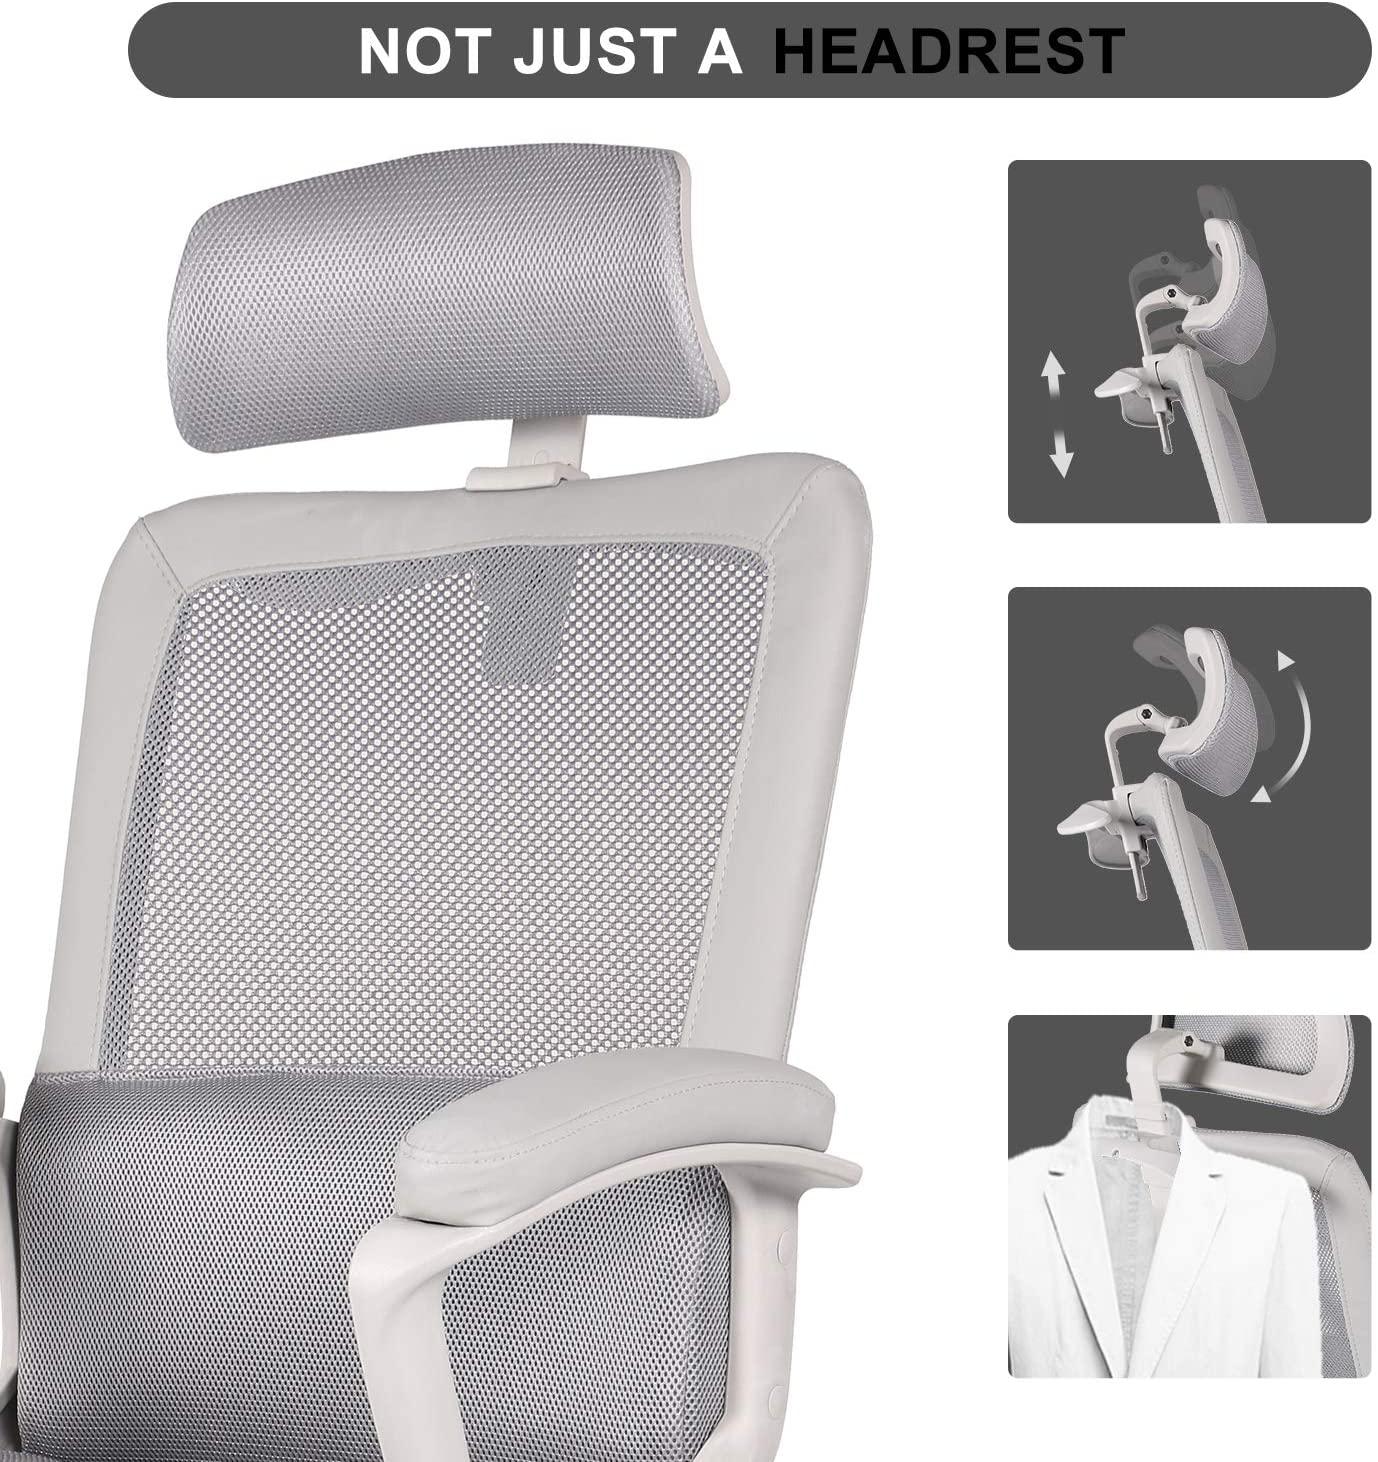 [US Direct] Original Smugdesk Office Chair, High Back Ergonomic Mesh Desk Office Chair with Padding Armrest and Adjustable Headrest -Gray